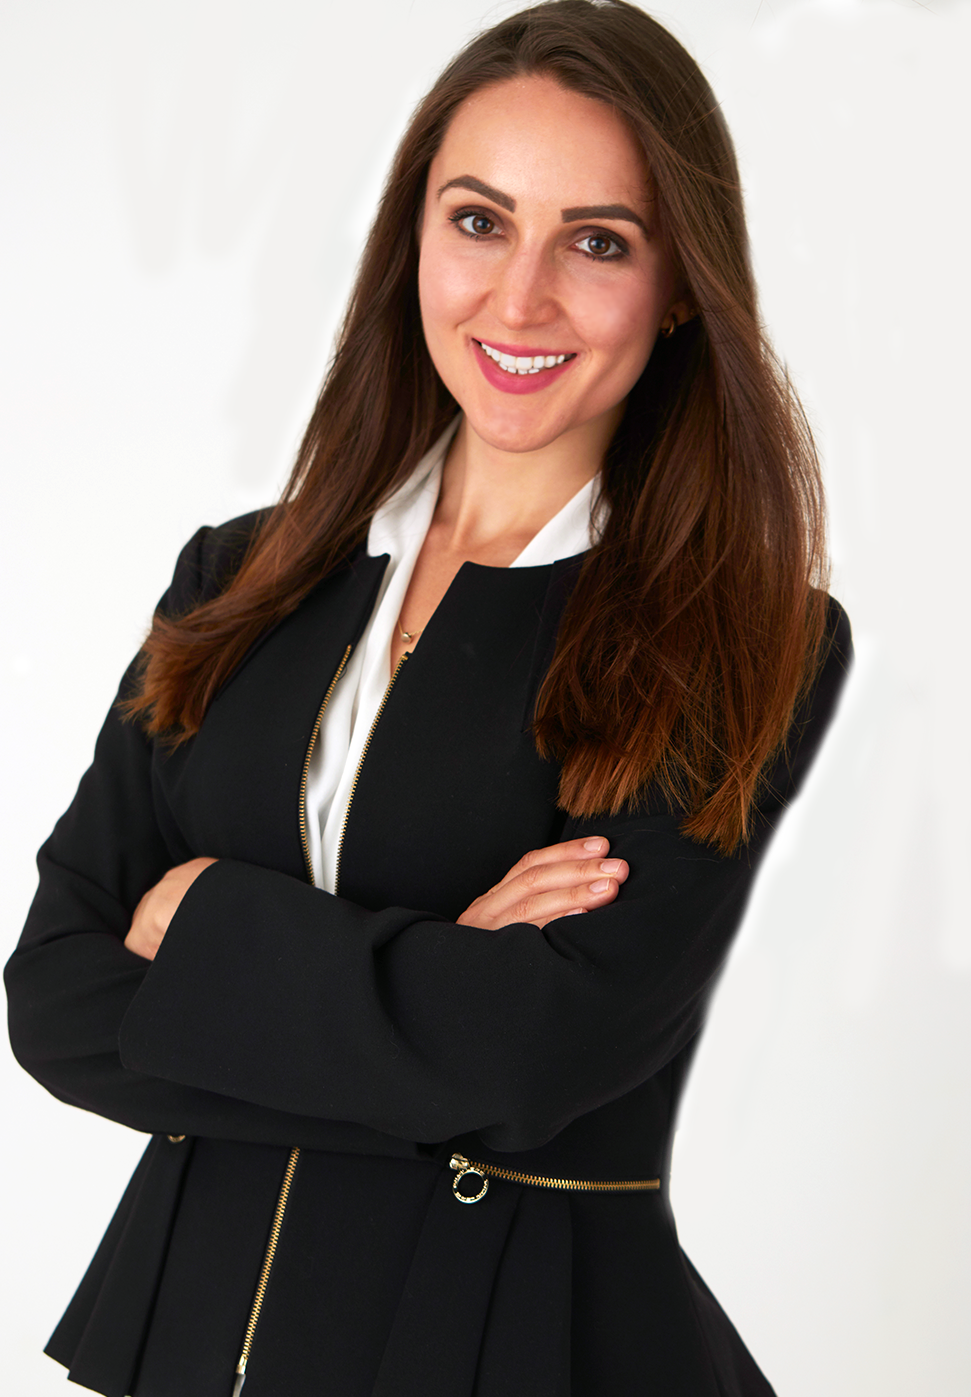 Mariya Finkelshteyn CEO of Orchid Agency, B2B marketing services for startups, startup marketing.